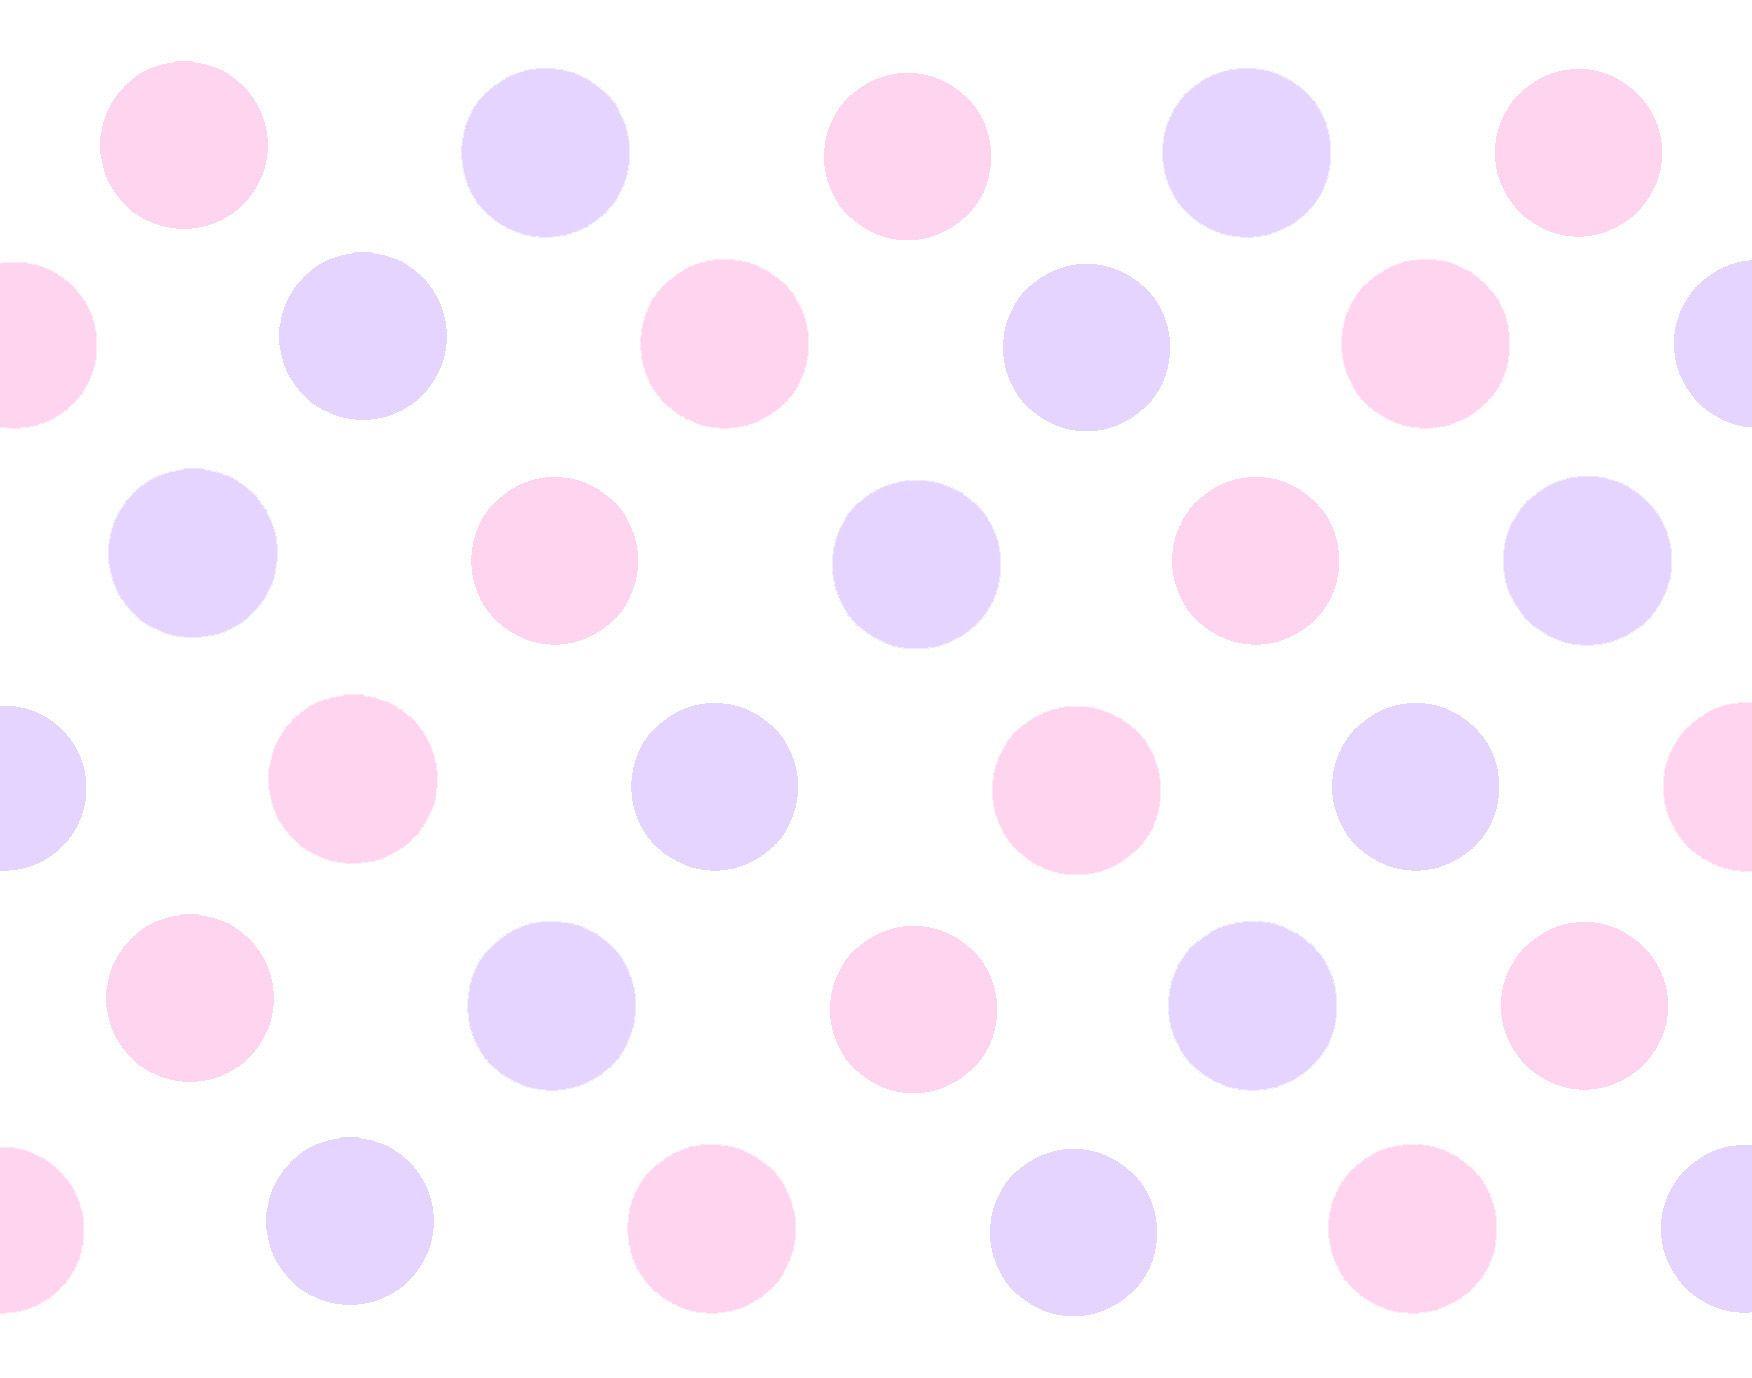 Pink and Purple Polka Dots 2.jpg 1,752u00d71,378 pixels : Backgrounds ...